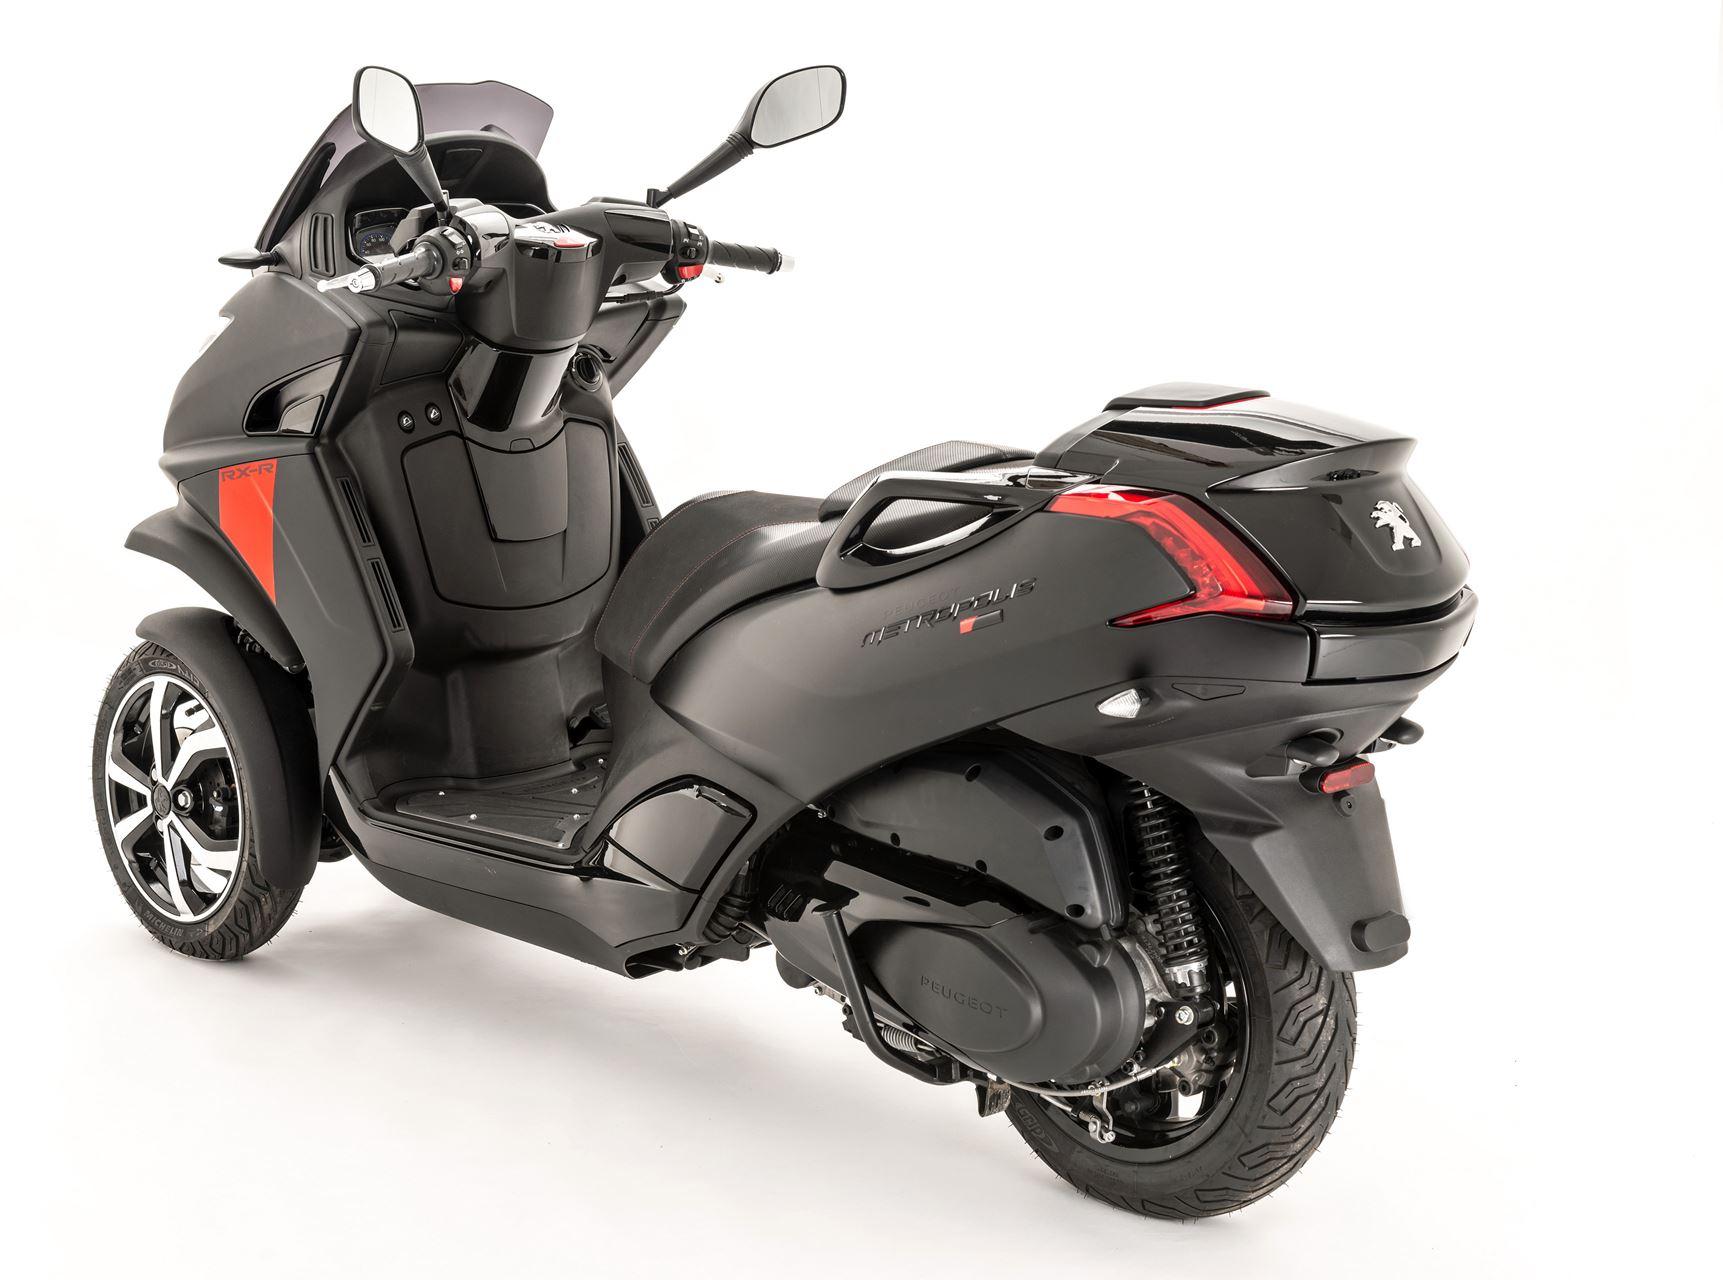 peugeot metropolis rx r scooter 400cc andar de moto. Black Bedroom Furniture Sets. Home Design Ideas